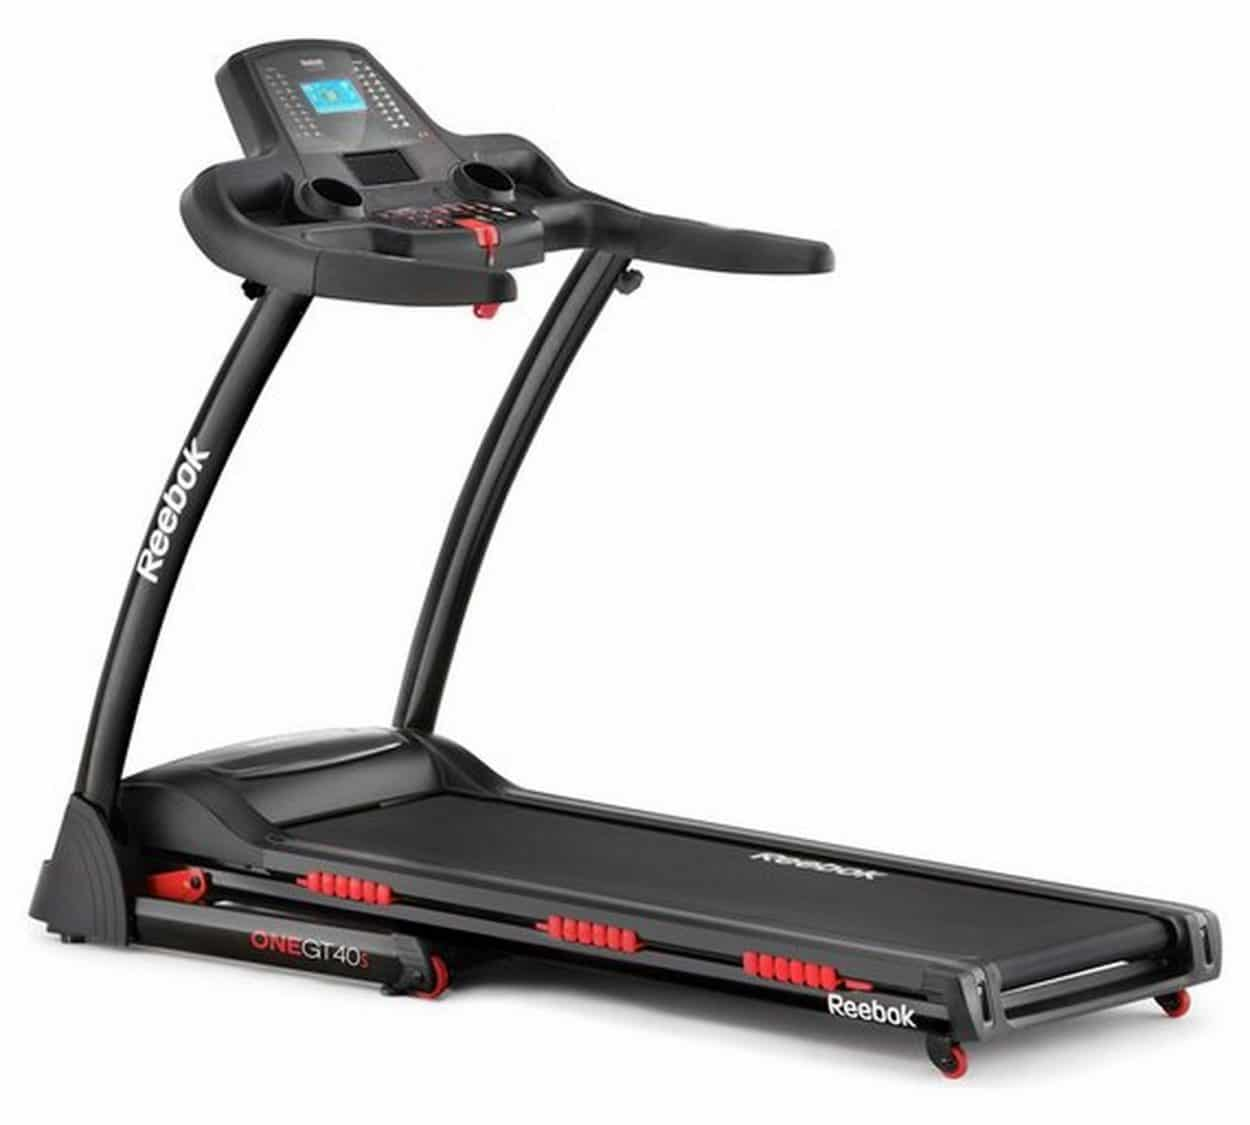 Reebok Fitness | GT40s Treadmill